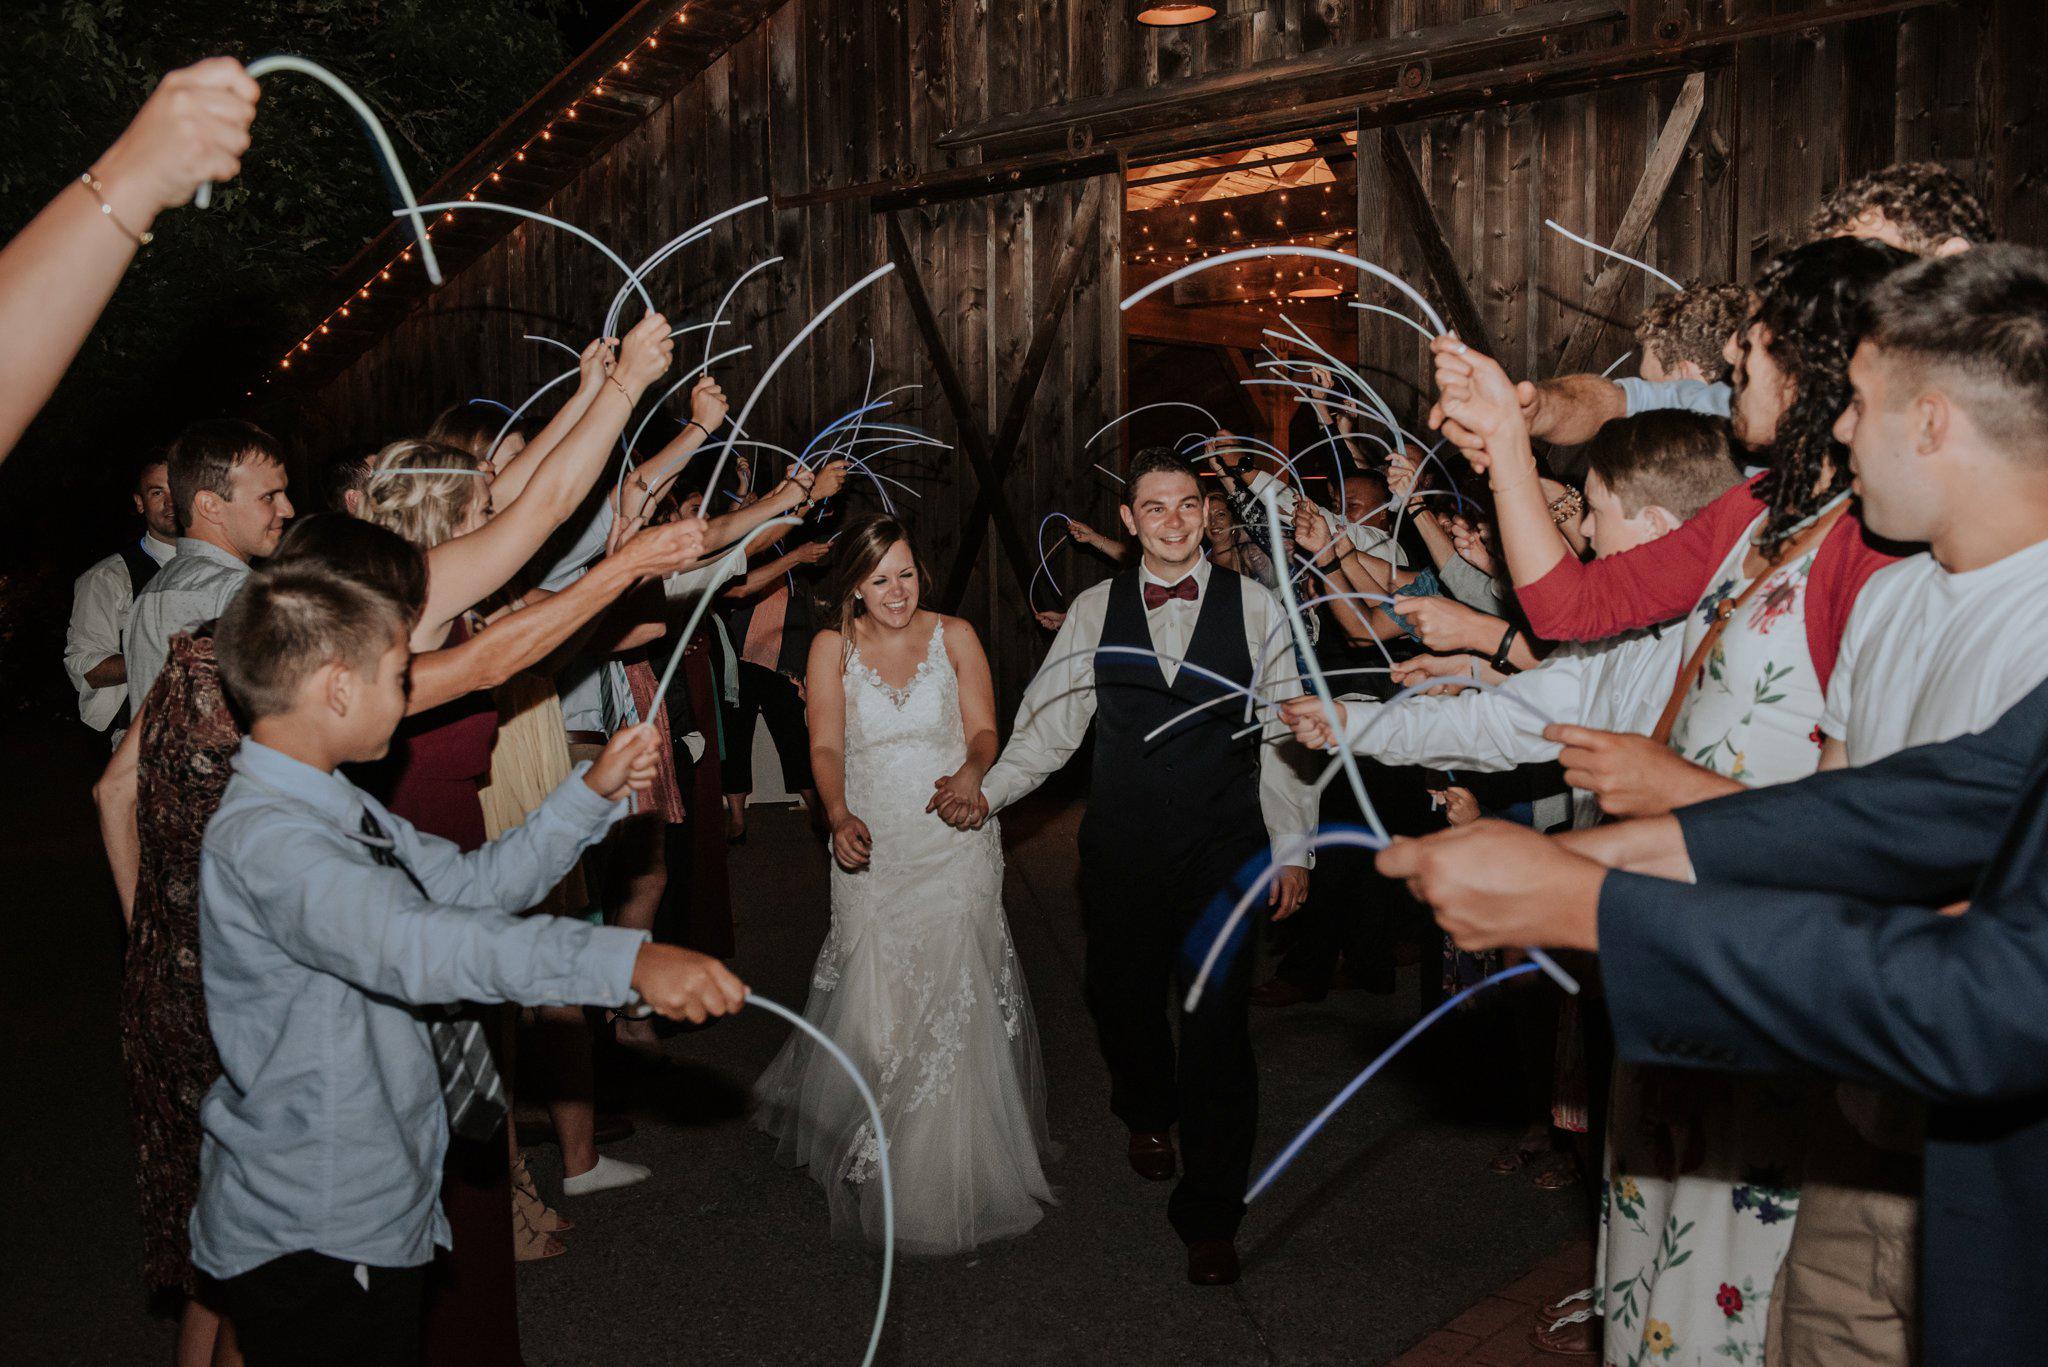 kristen-and-cody-the-kelley-farm-wedding-seattle-photographer-caitlyn-nikula-128.jpg